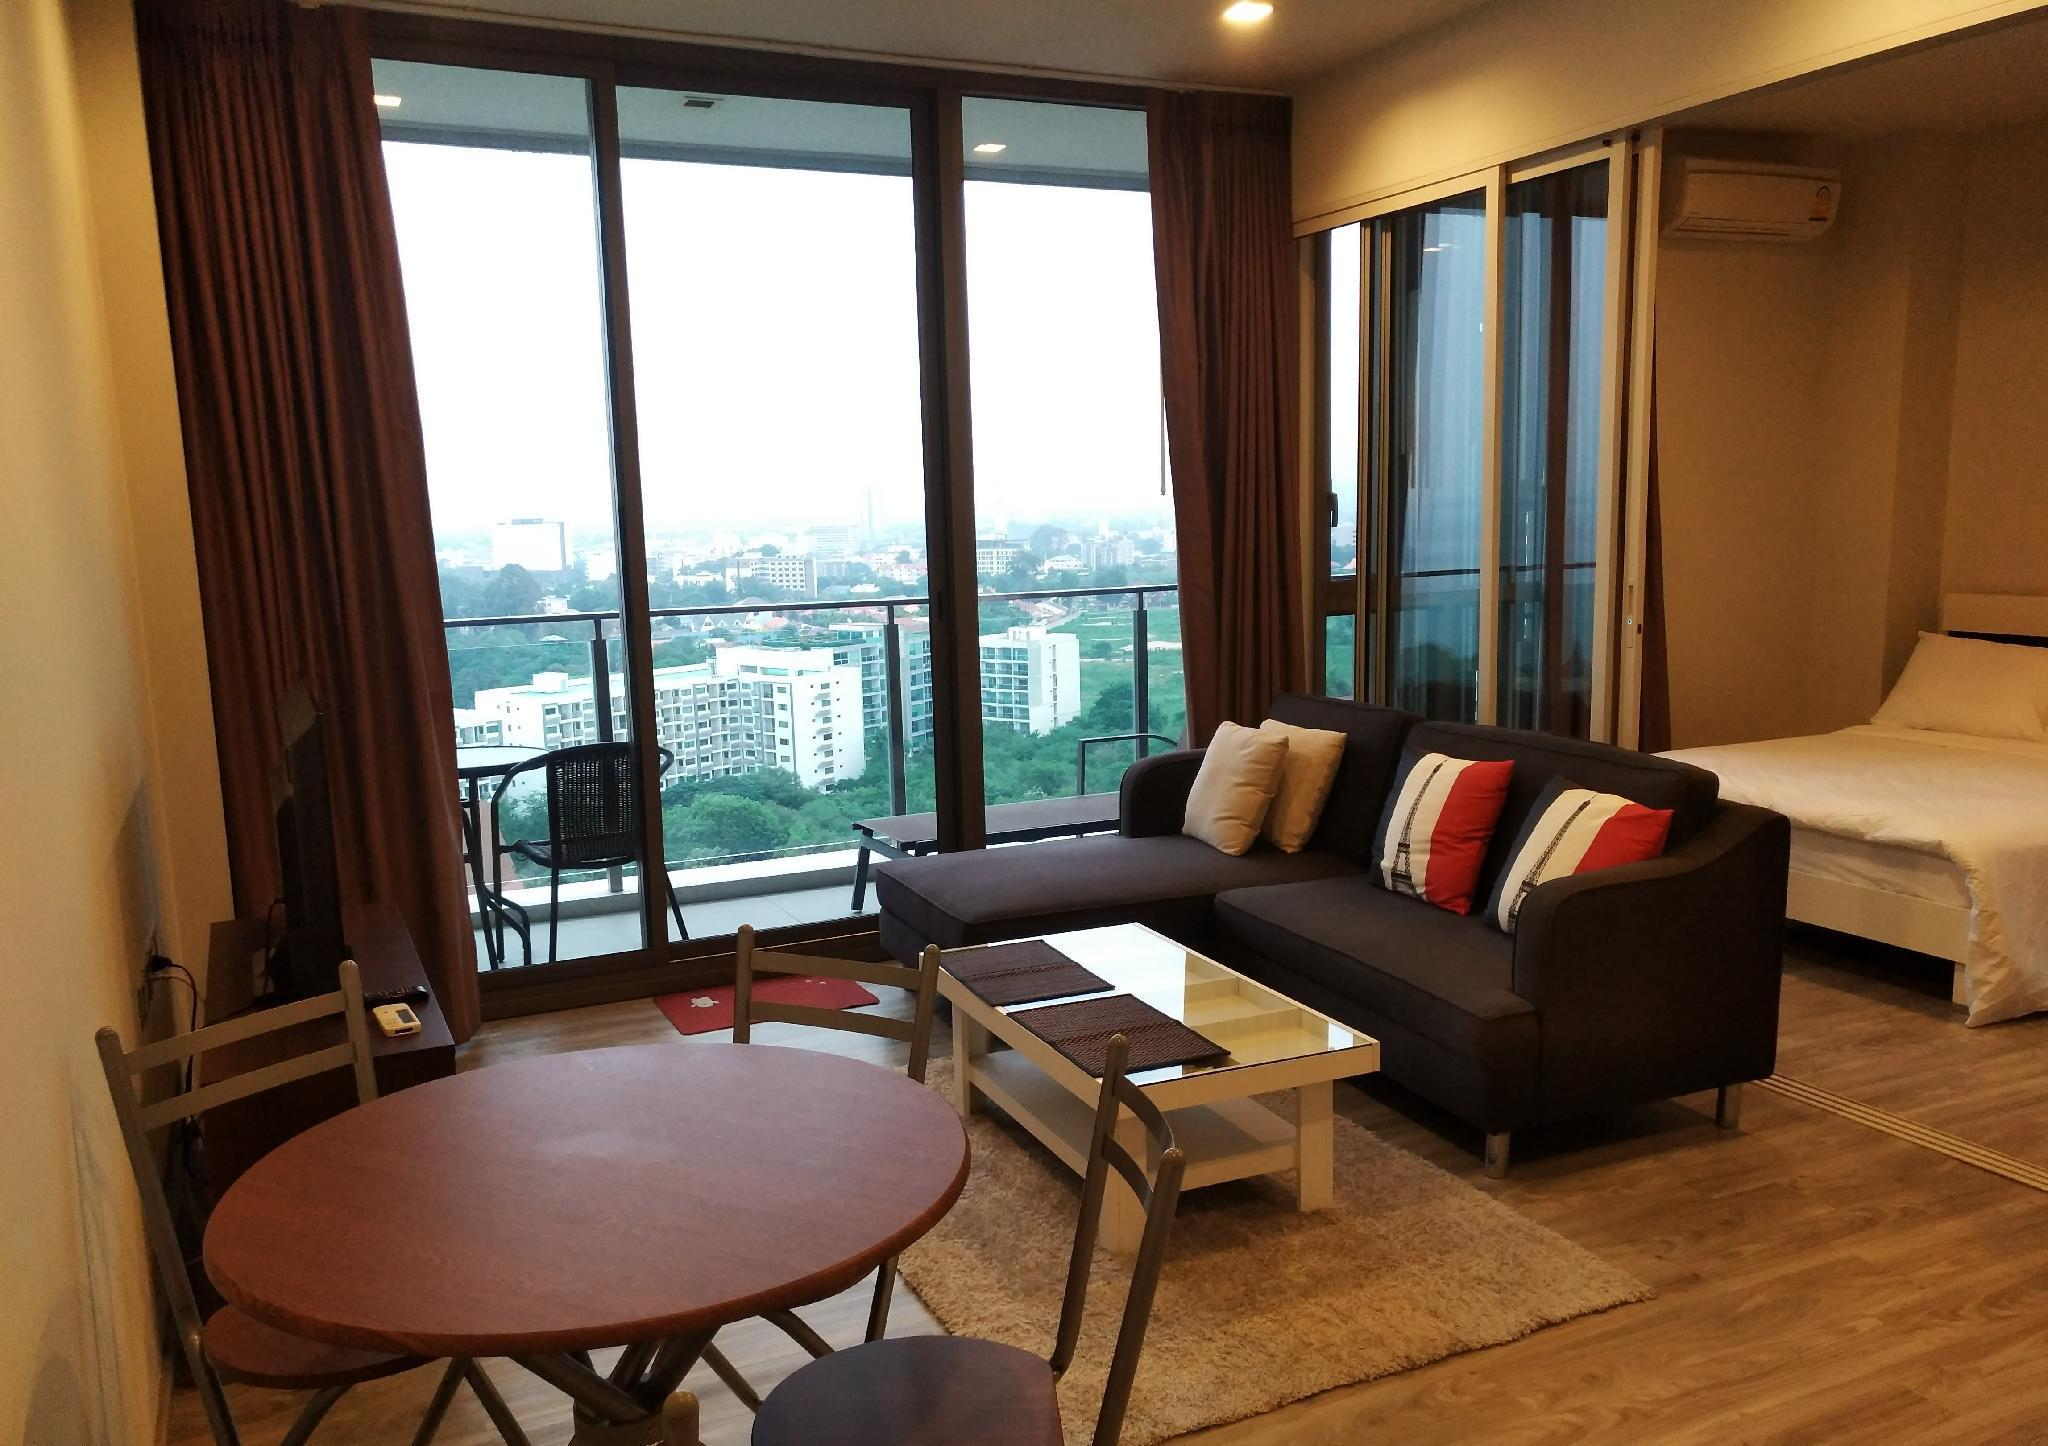 Baan Plai Haad - sea view อพาร์ตเมนต์ 1 ห้องนอน 1 ห้องน้ำส่วนตัว ขนาด 54 ตร.ม. – นาเกลือ/บางละมุง